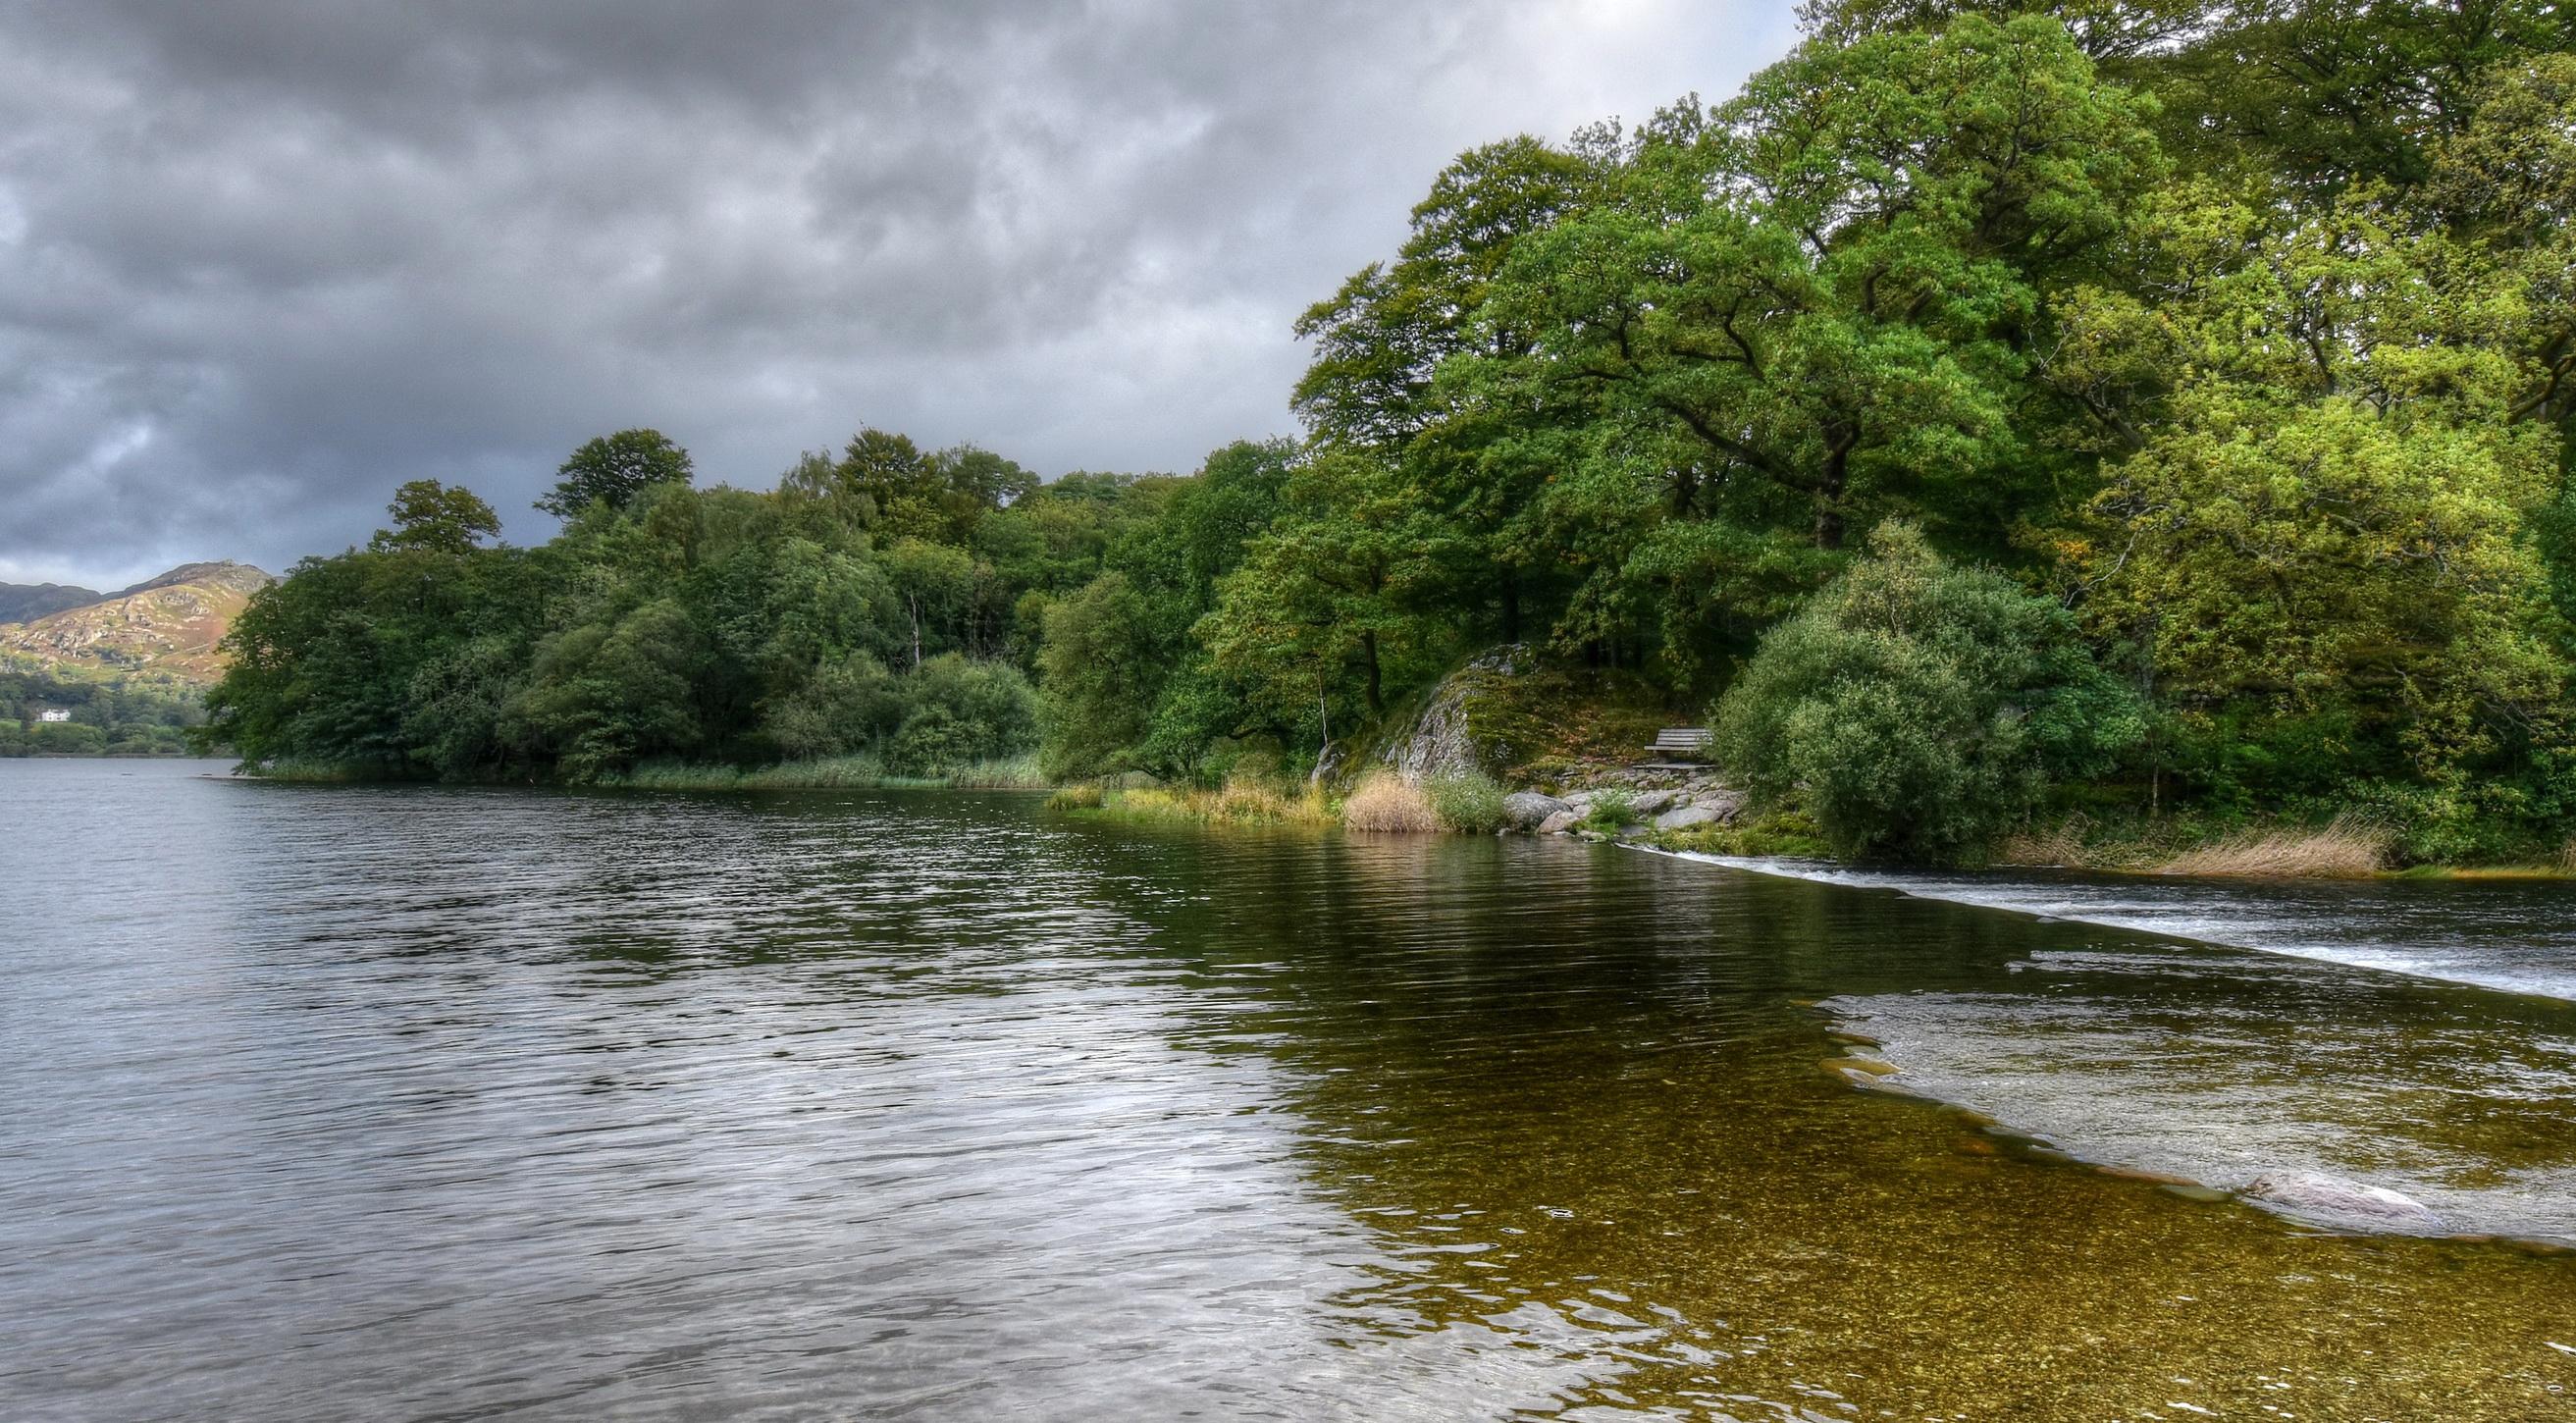 Картинка Англия Grassmere Природа речка Побережье Кусты дерево 2625x1450 Реки берег кустов дерева Деревья деревьев